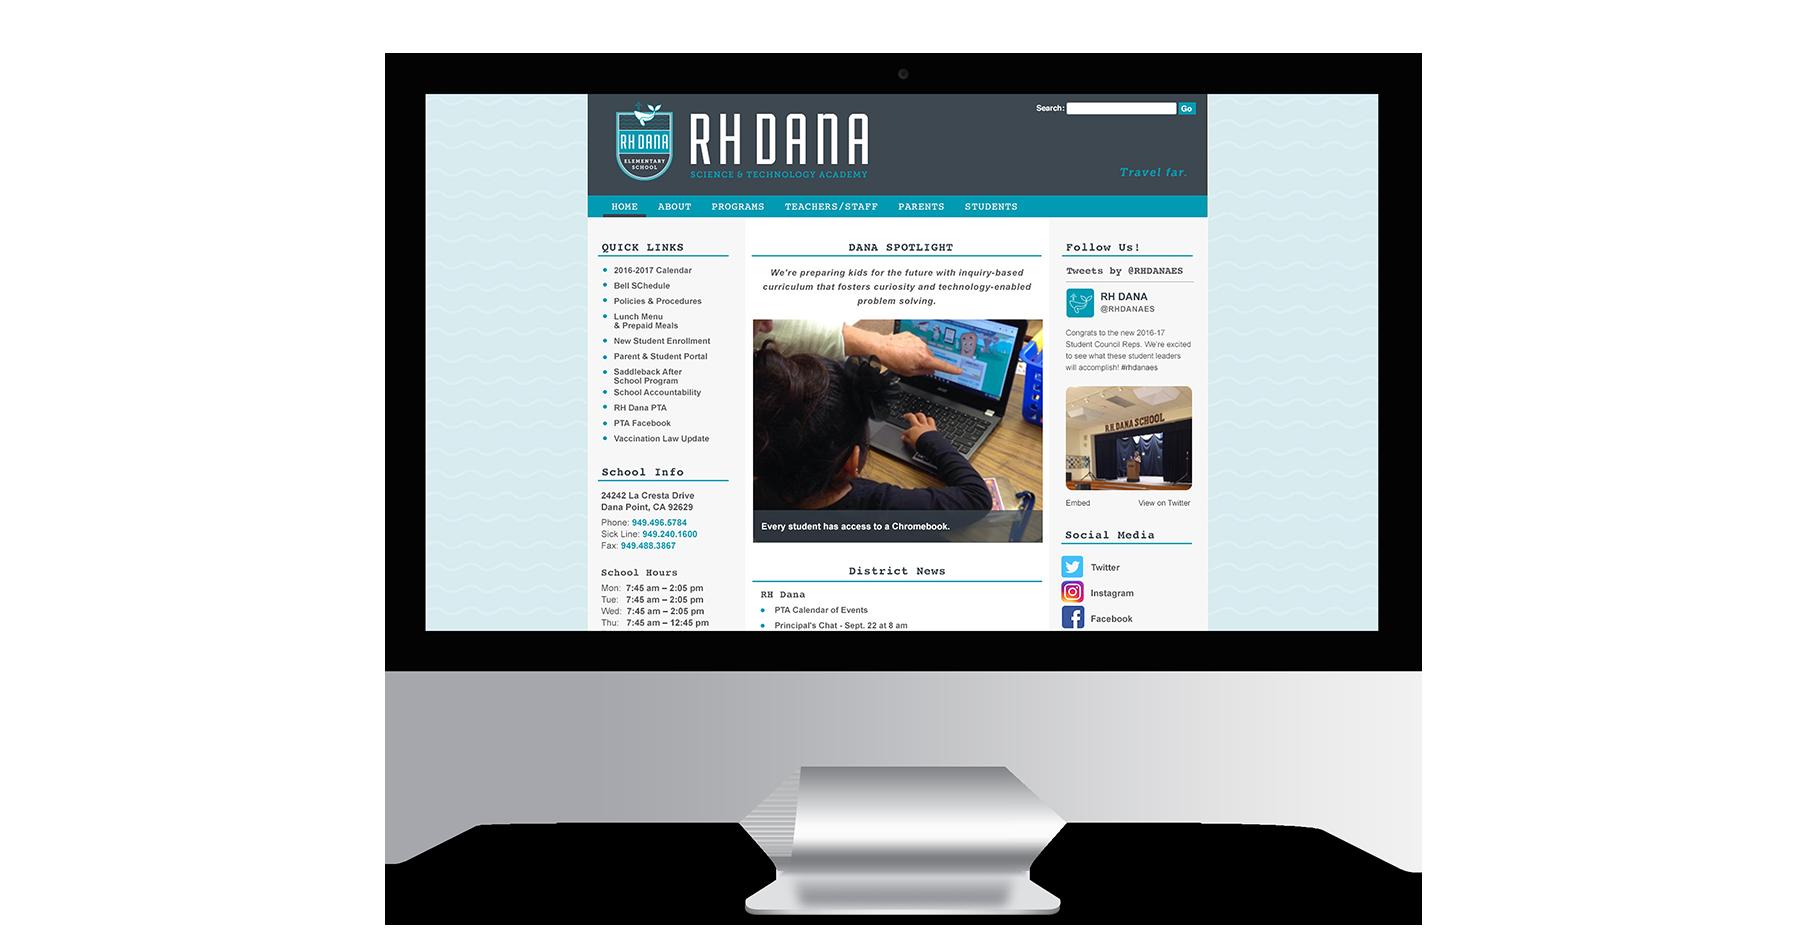 rh dana elementary school website design